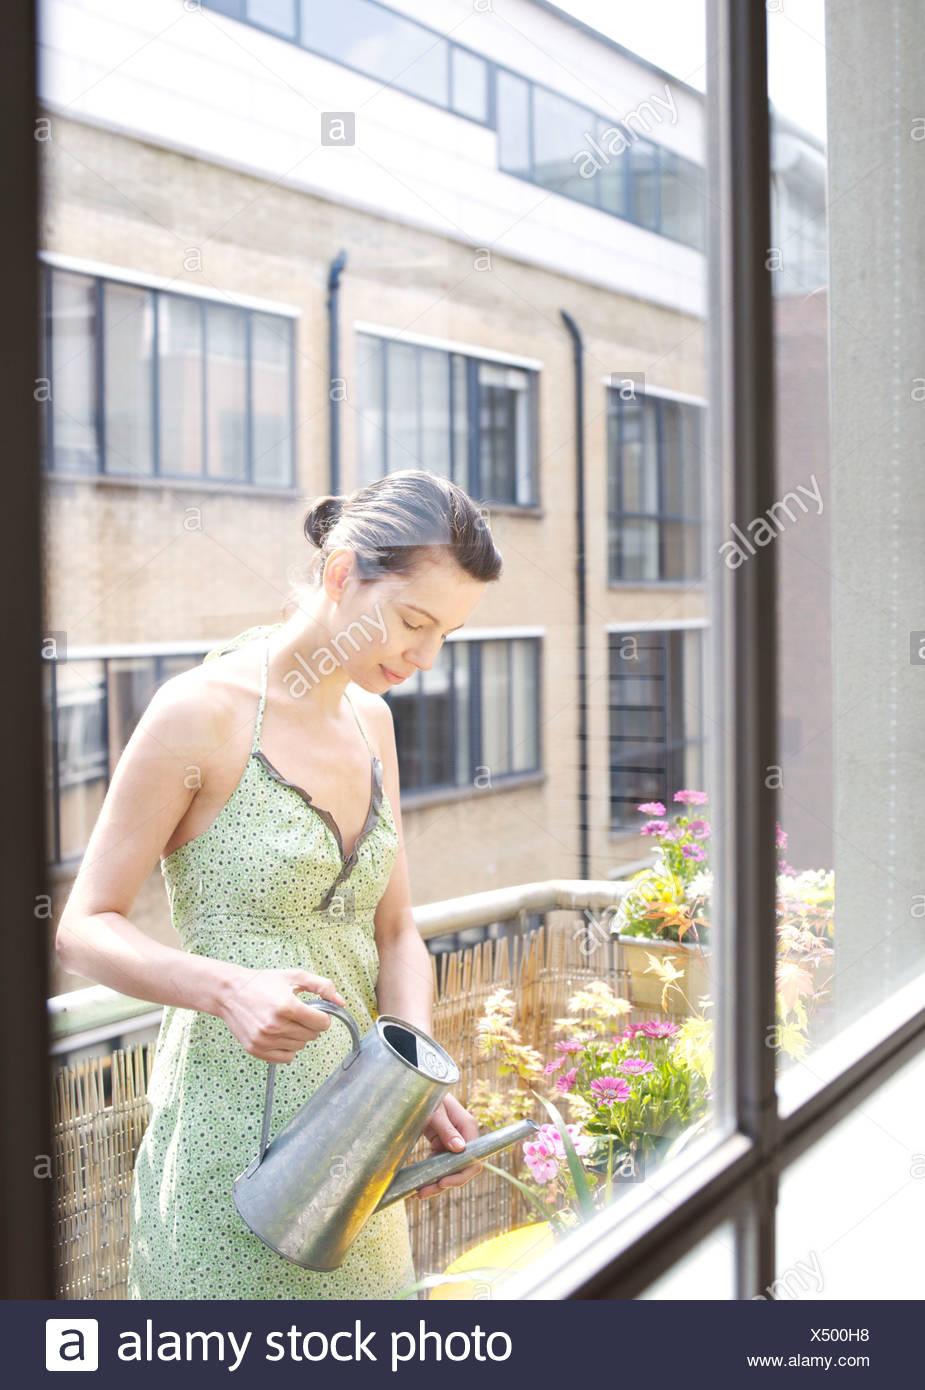 Woman on balcony watering flowers - Stock Image